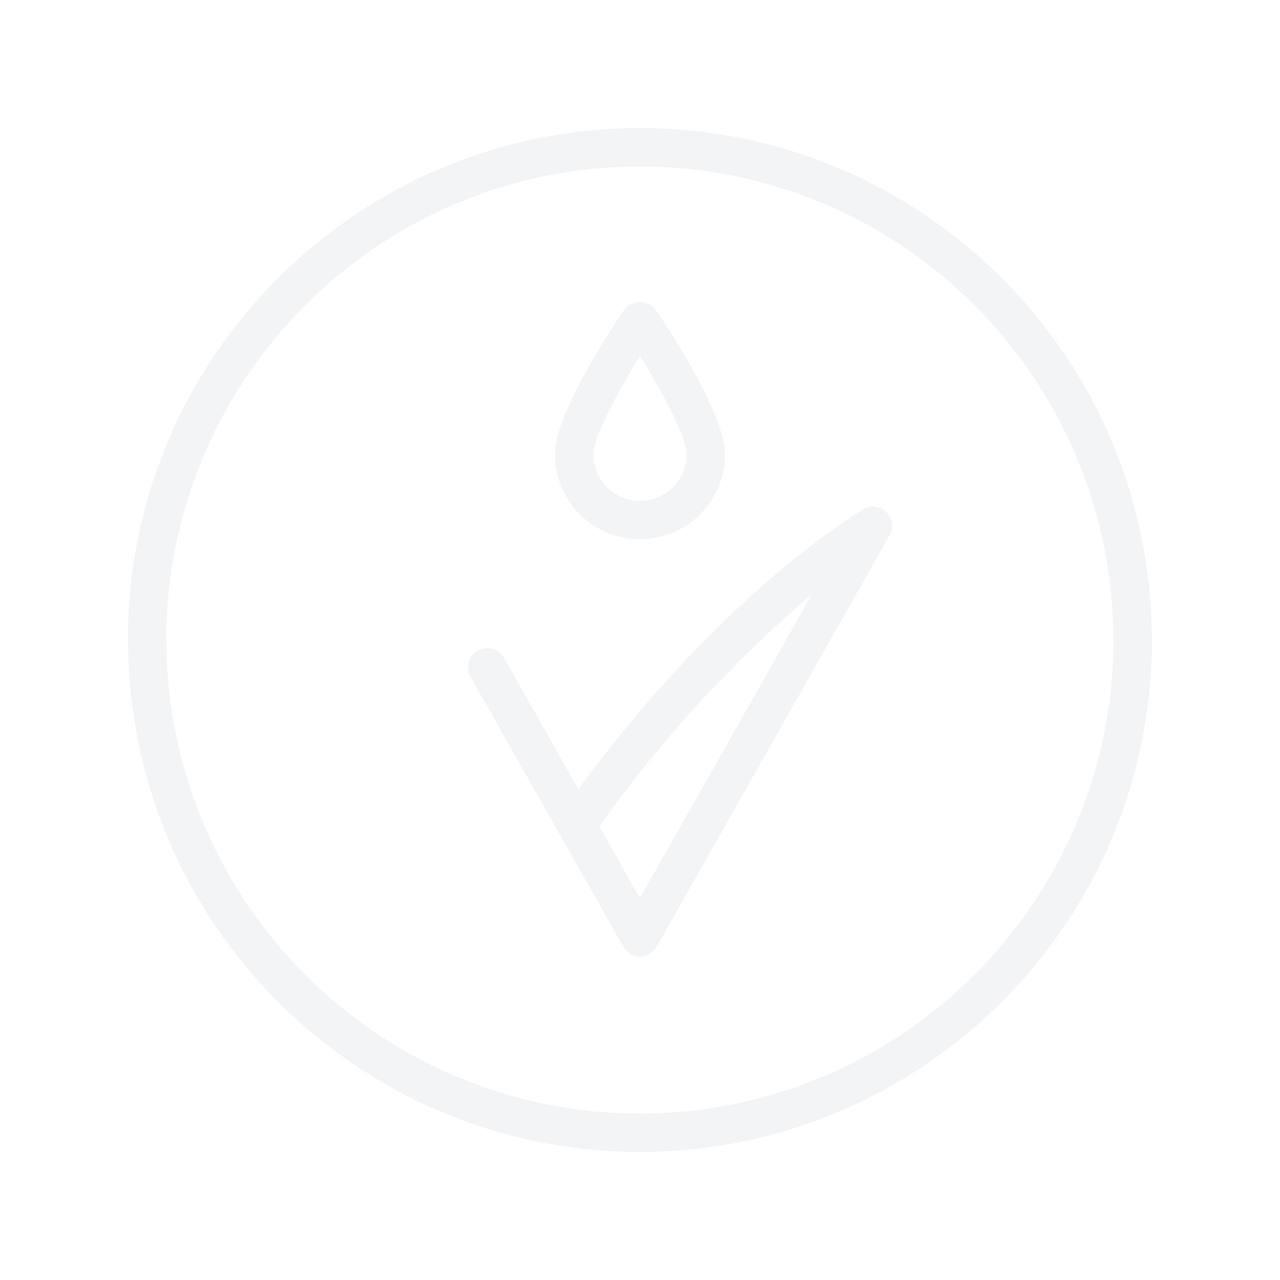 BIODROGA Anti-Age Soft Focus Make-Up 30ml